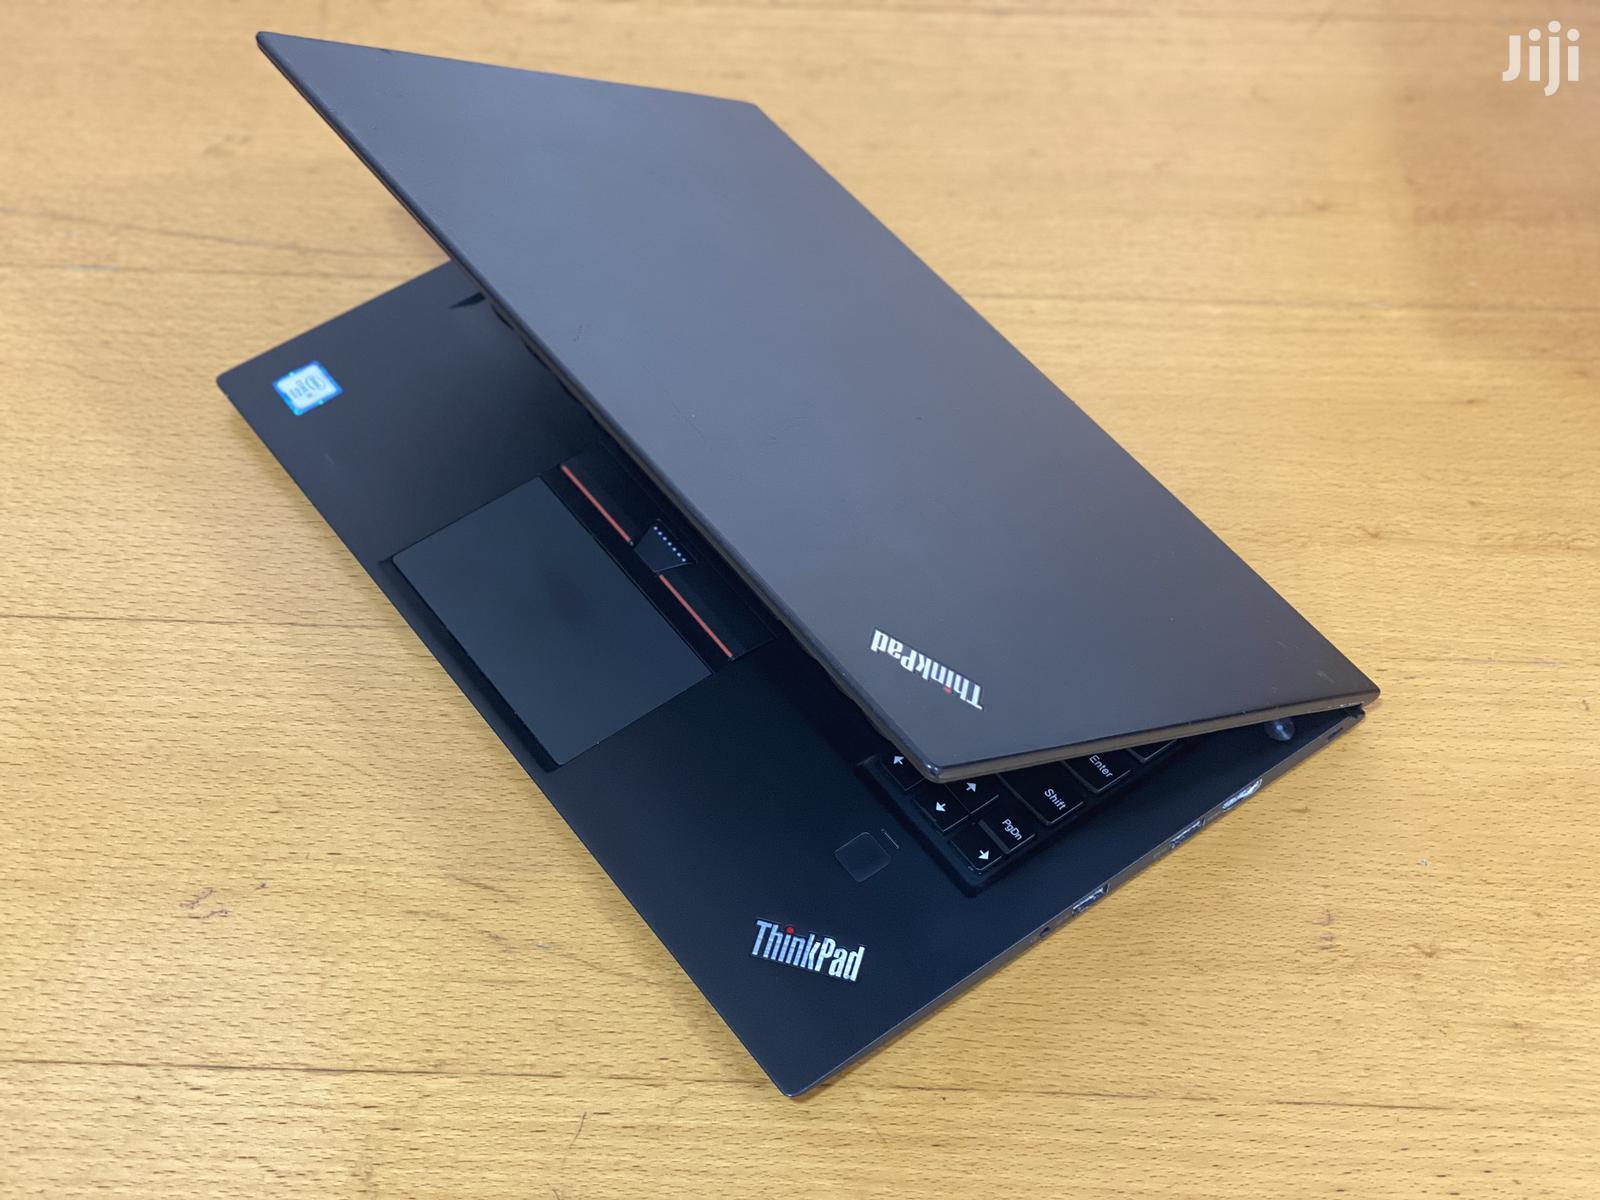 Laptop Lenovo ThinkPad X1 Carbon 8GB Intel Core I5 SSD 256GB